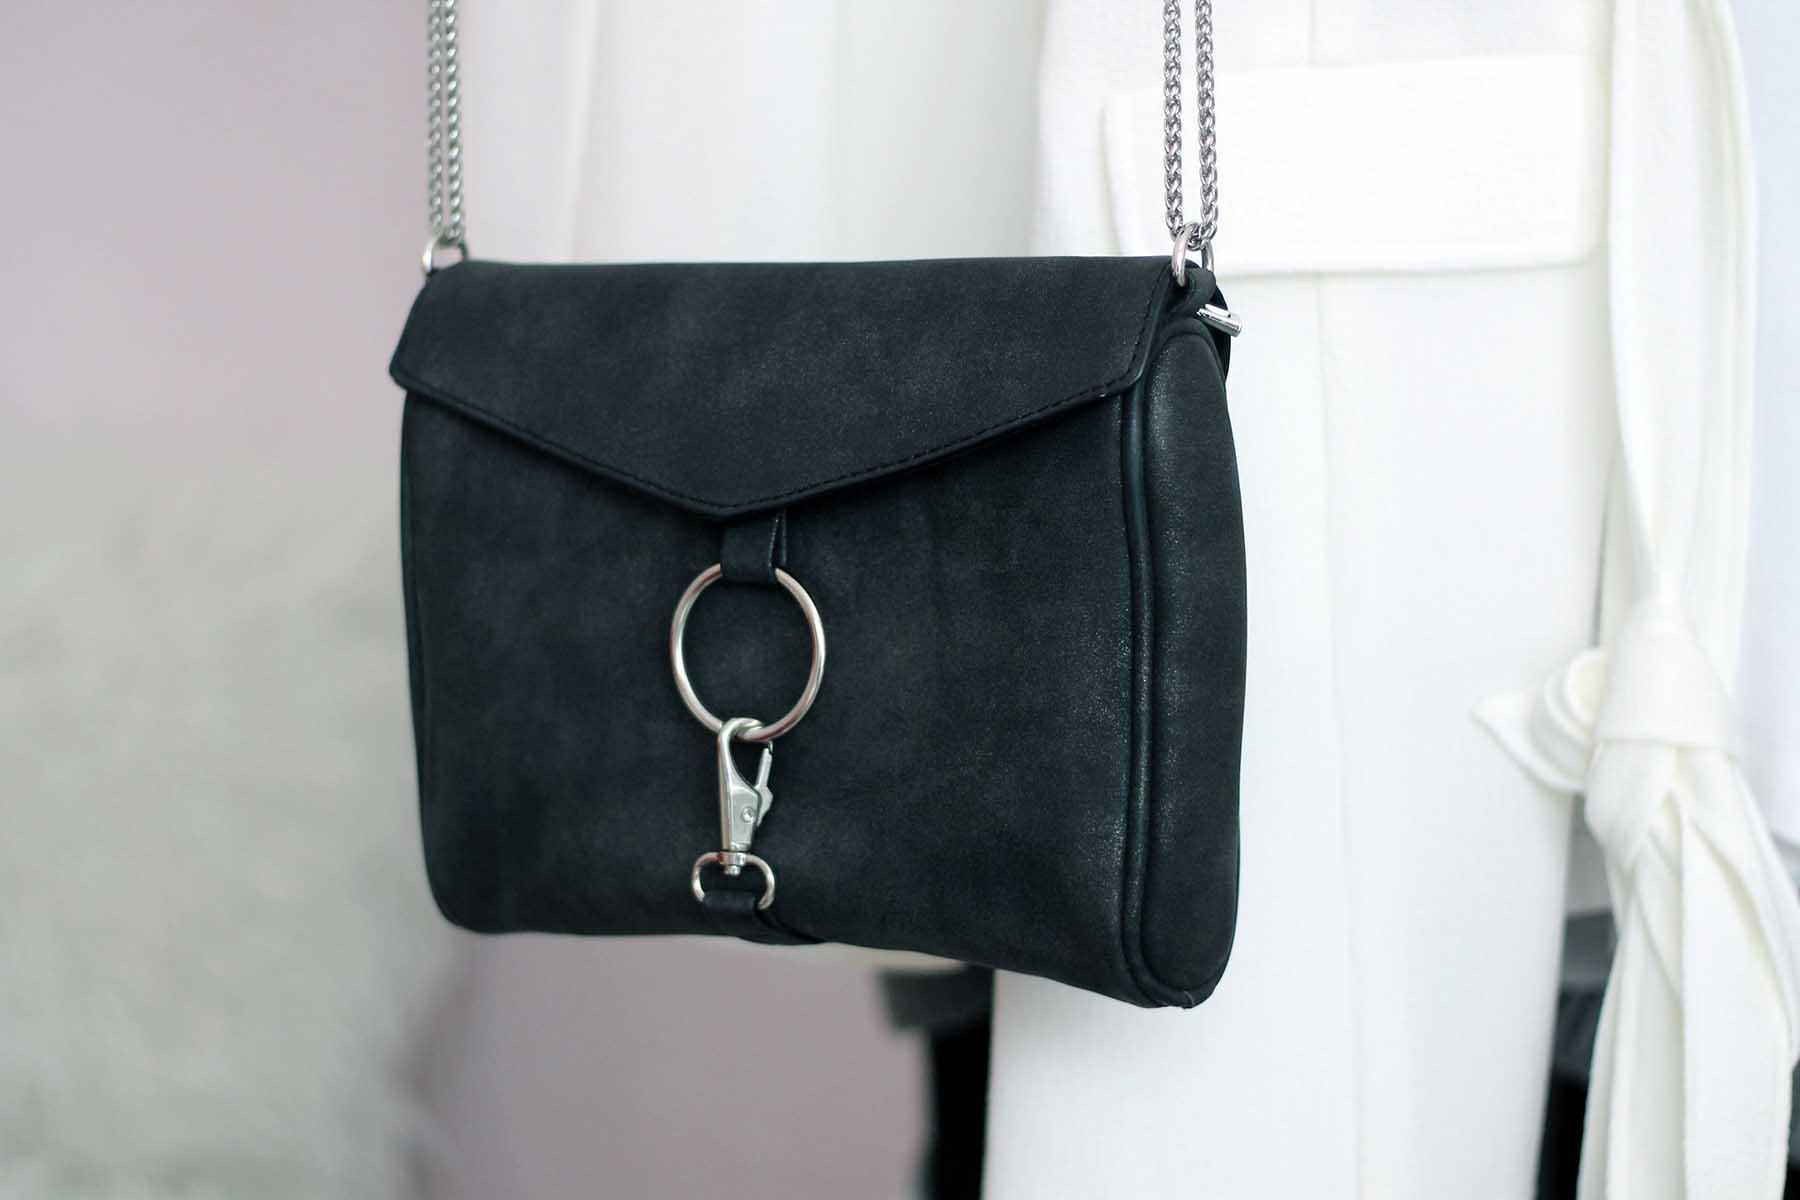 BASIC-must-haves-modeblog-fashionblog-7